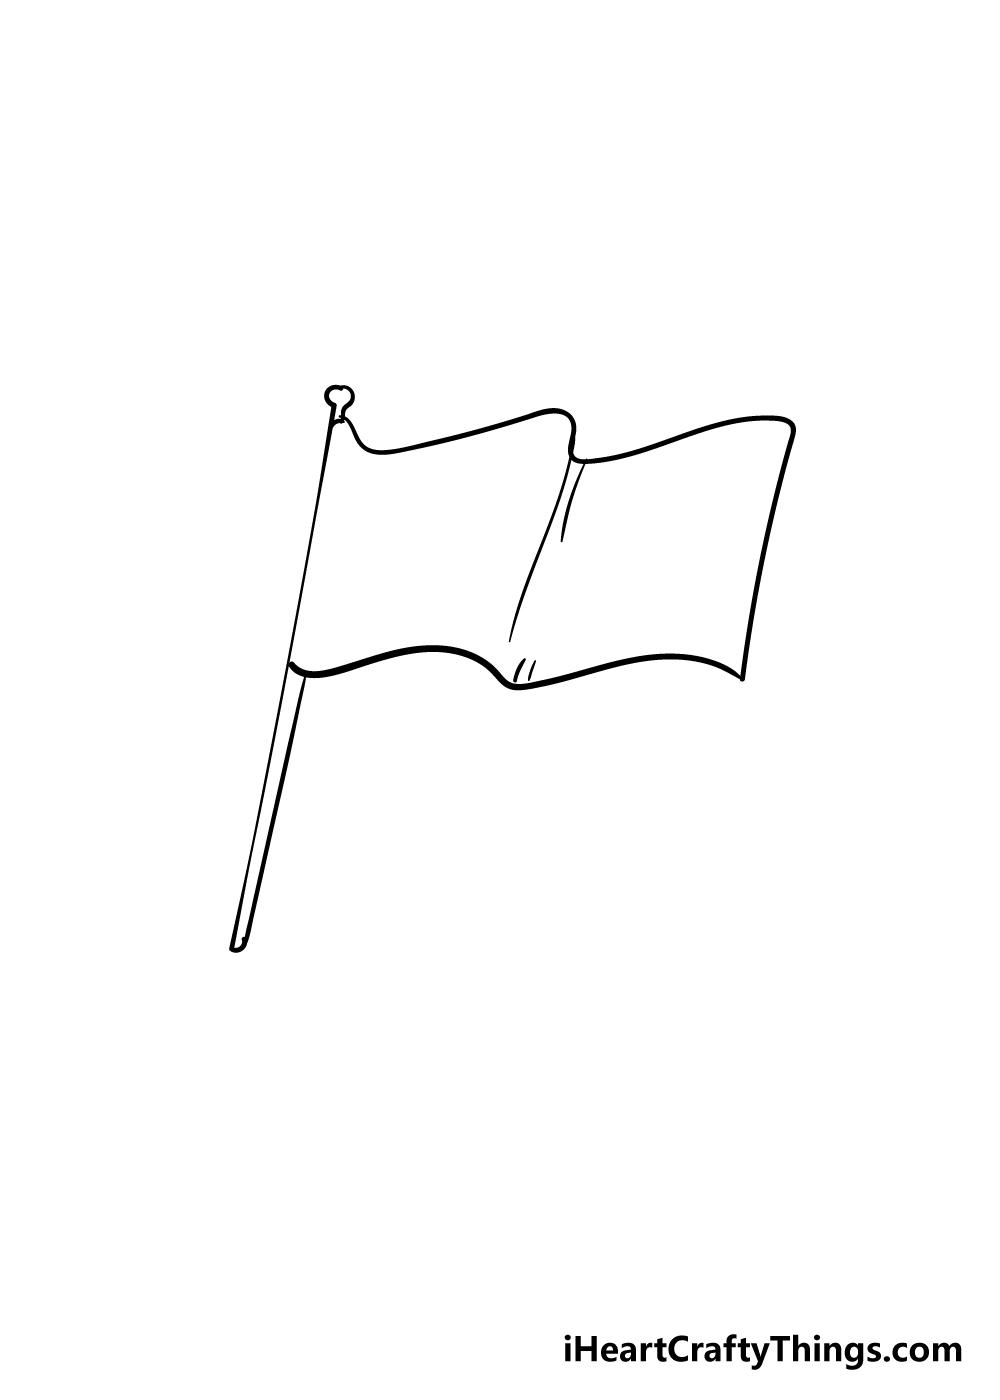 flag drawing step 5